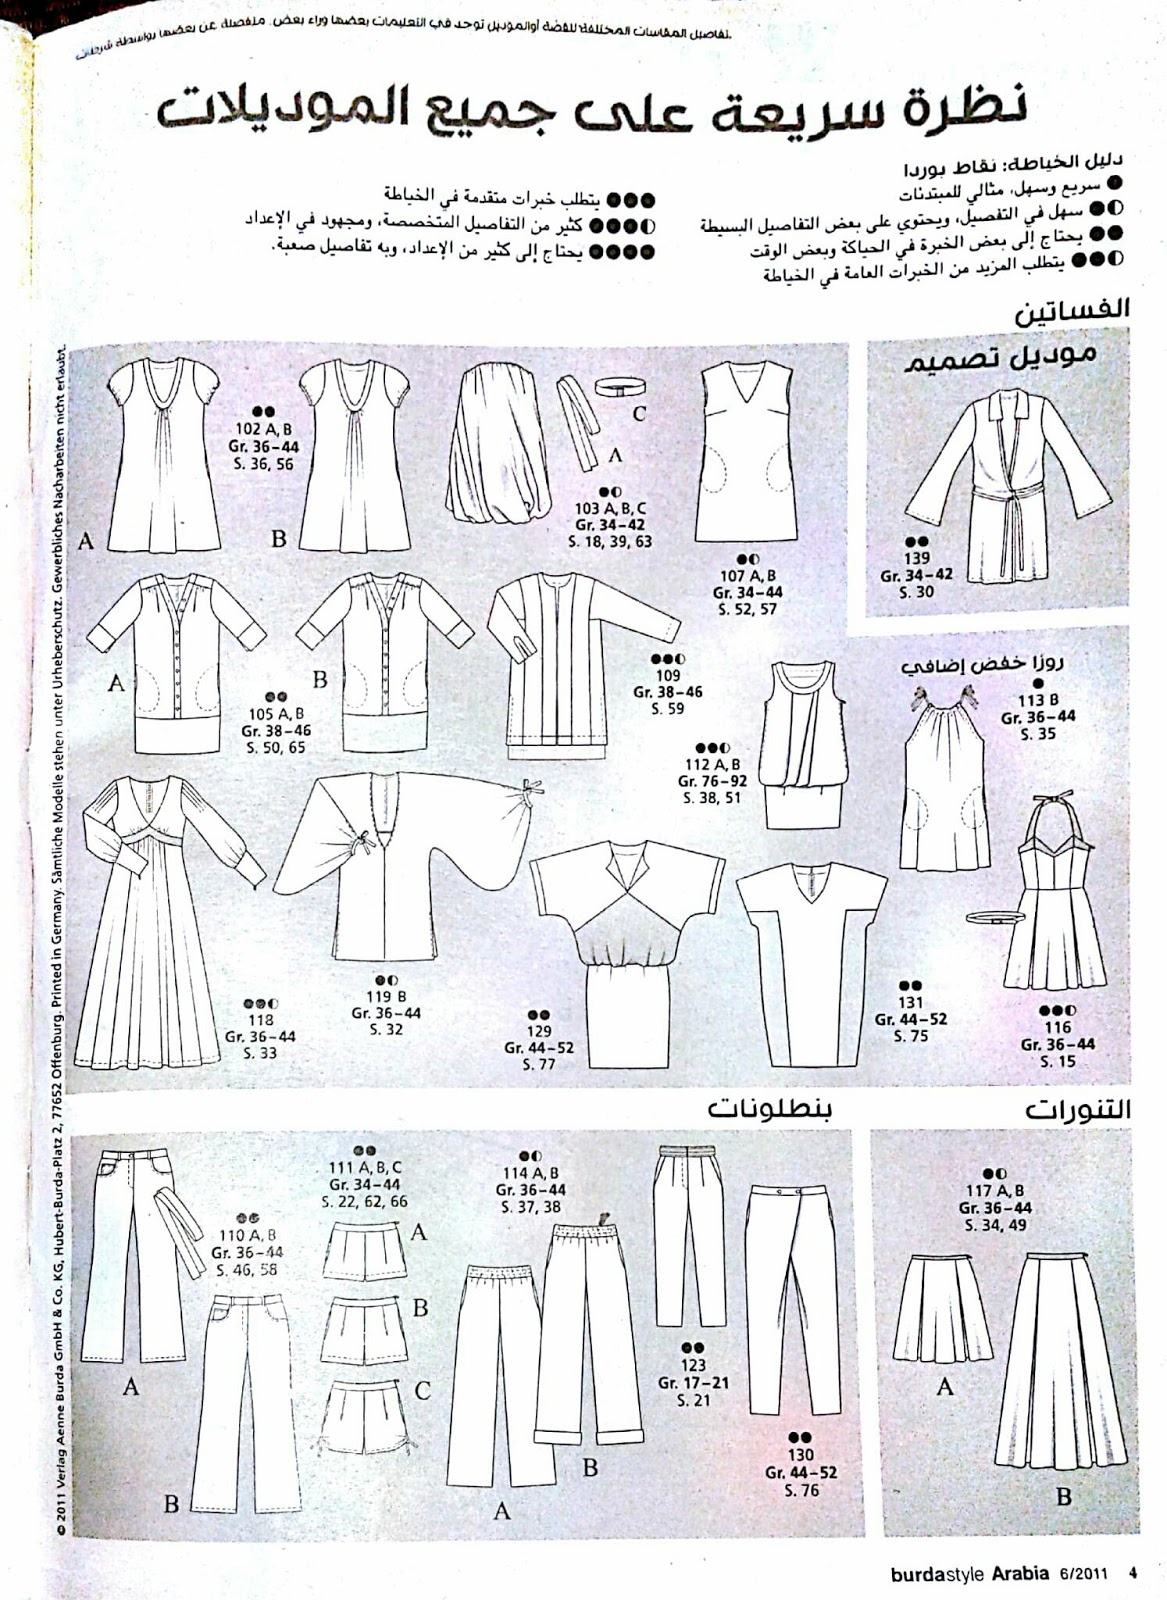 817660b811ede ارشادات بوردا مع طريقة اخذ المقاسات بالعربي ~ تعليم خياطة-Learn sewing